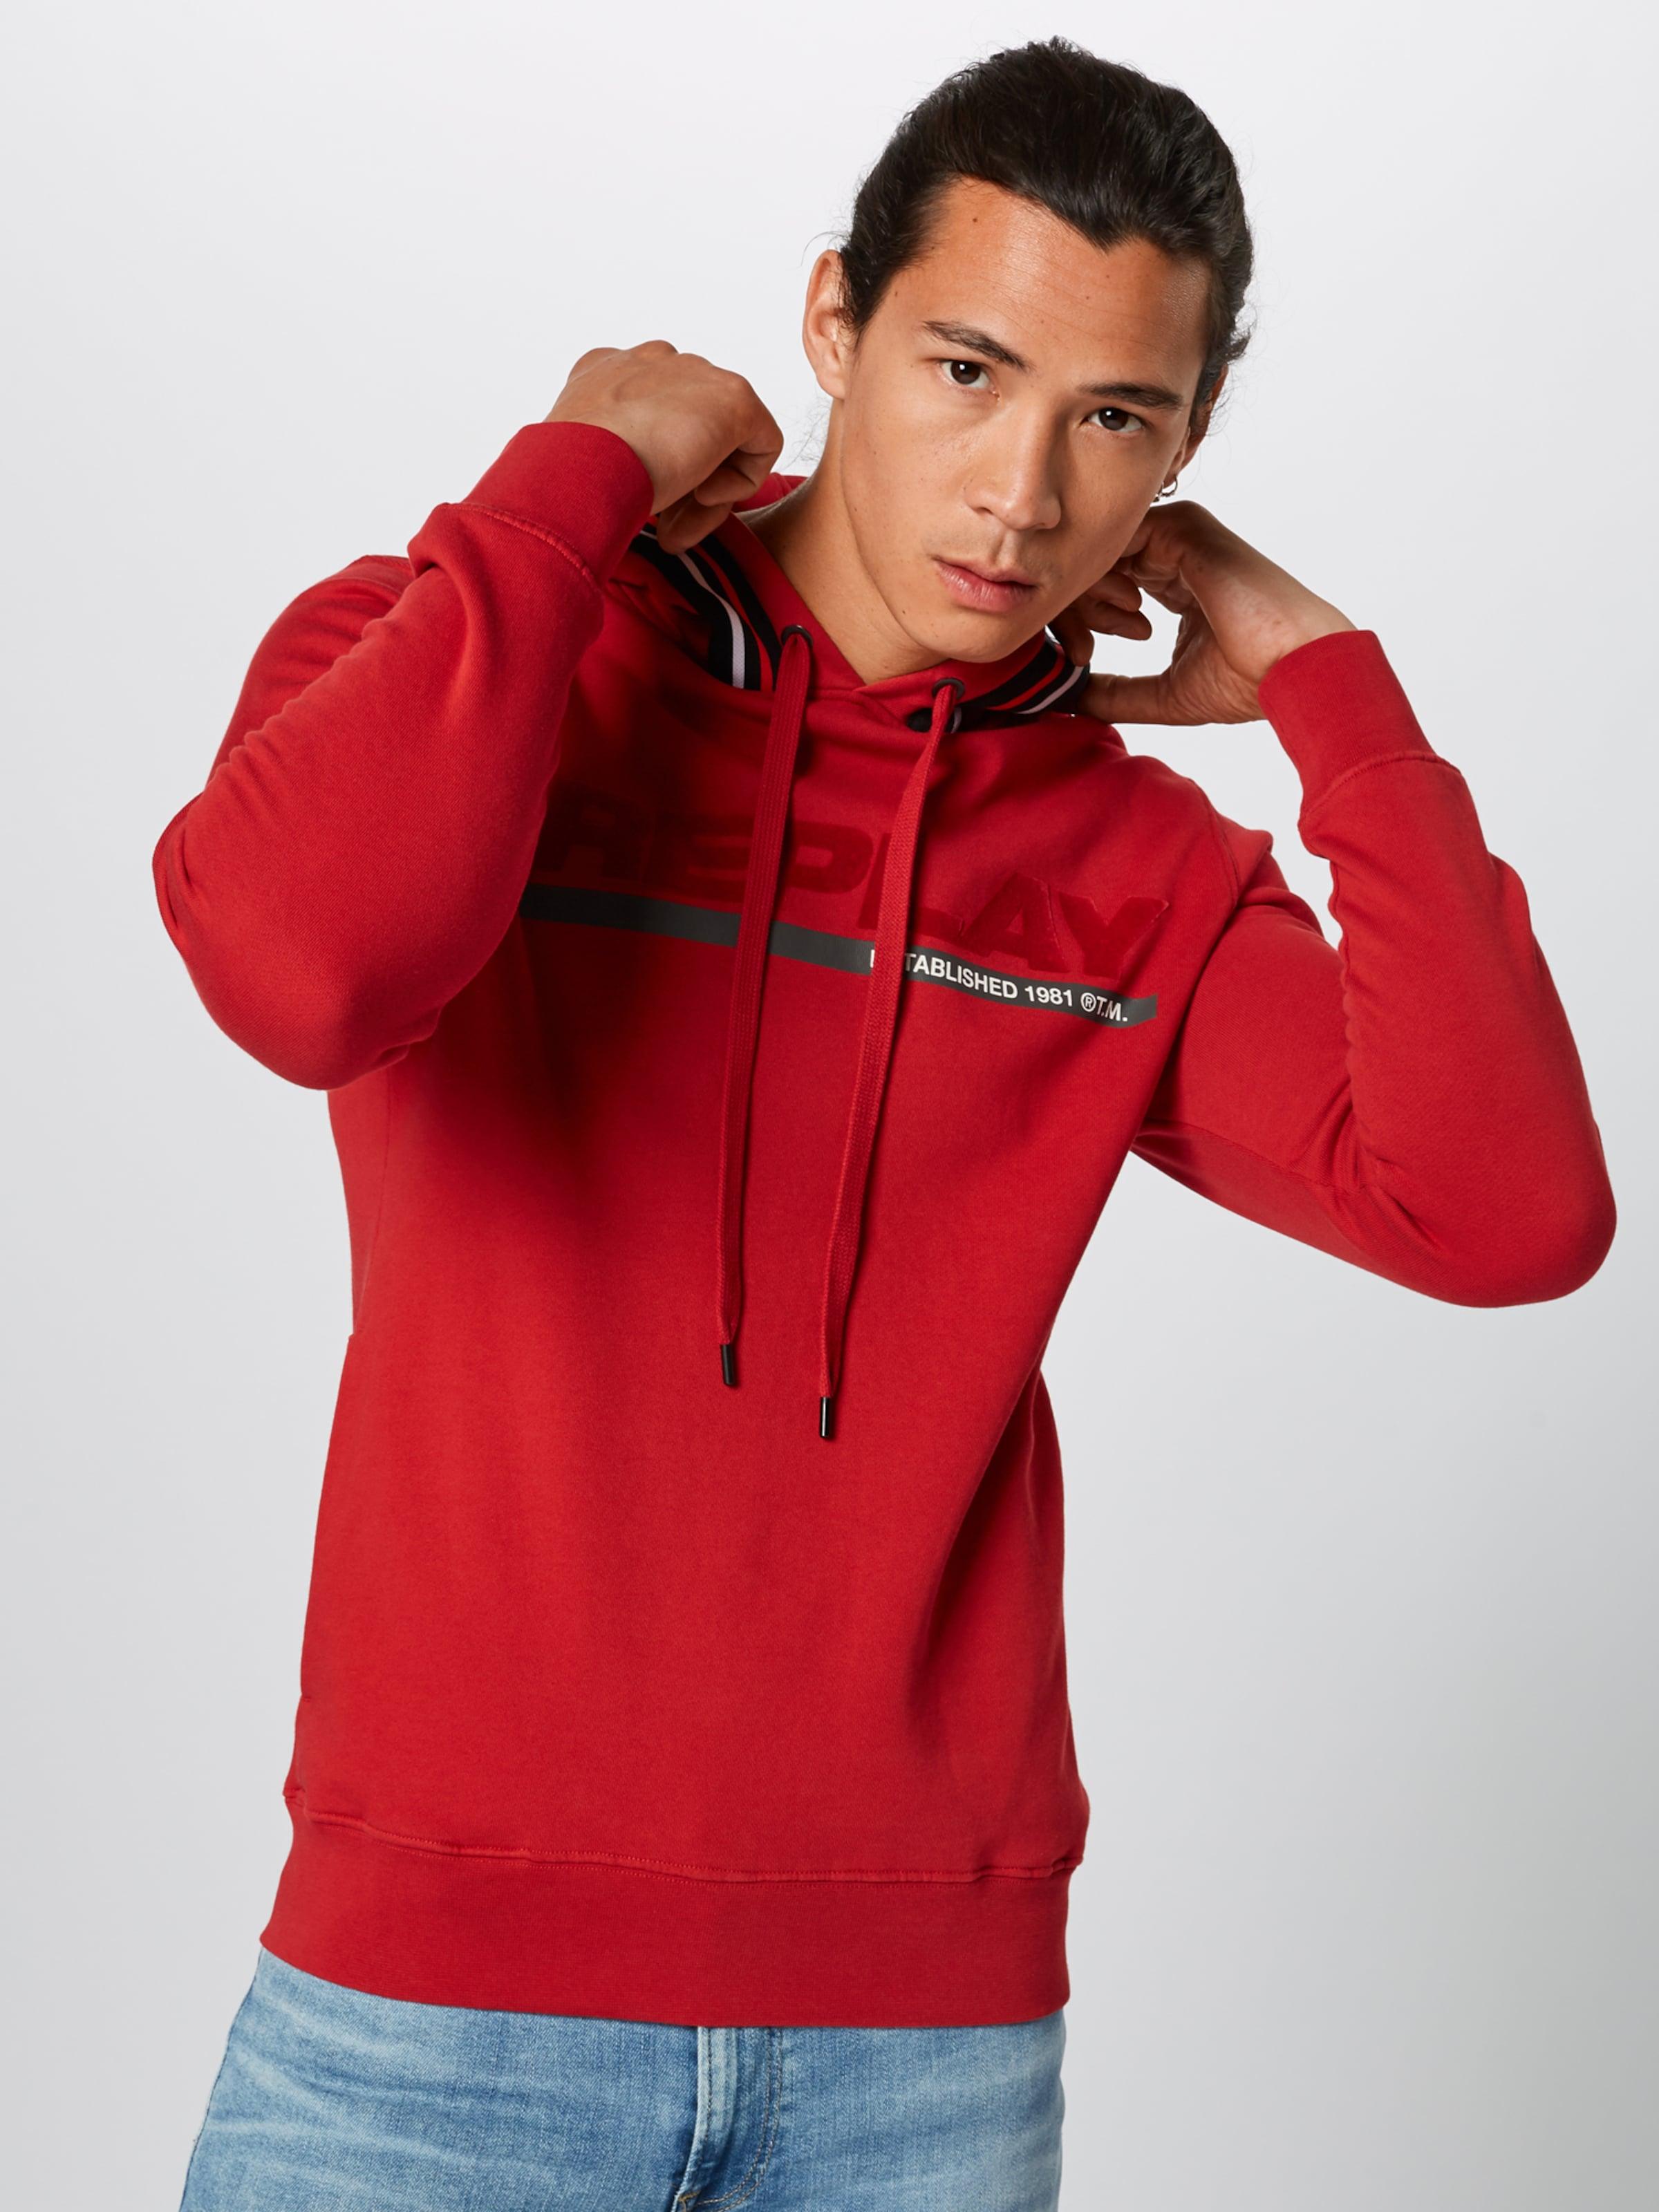 In In Replay Sweatshirt Replay Rot Sweatshirt Rot Replay Sweatshirt Replay In Sweatshirt Rot In 3jL5ARq4